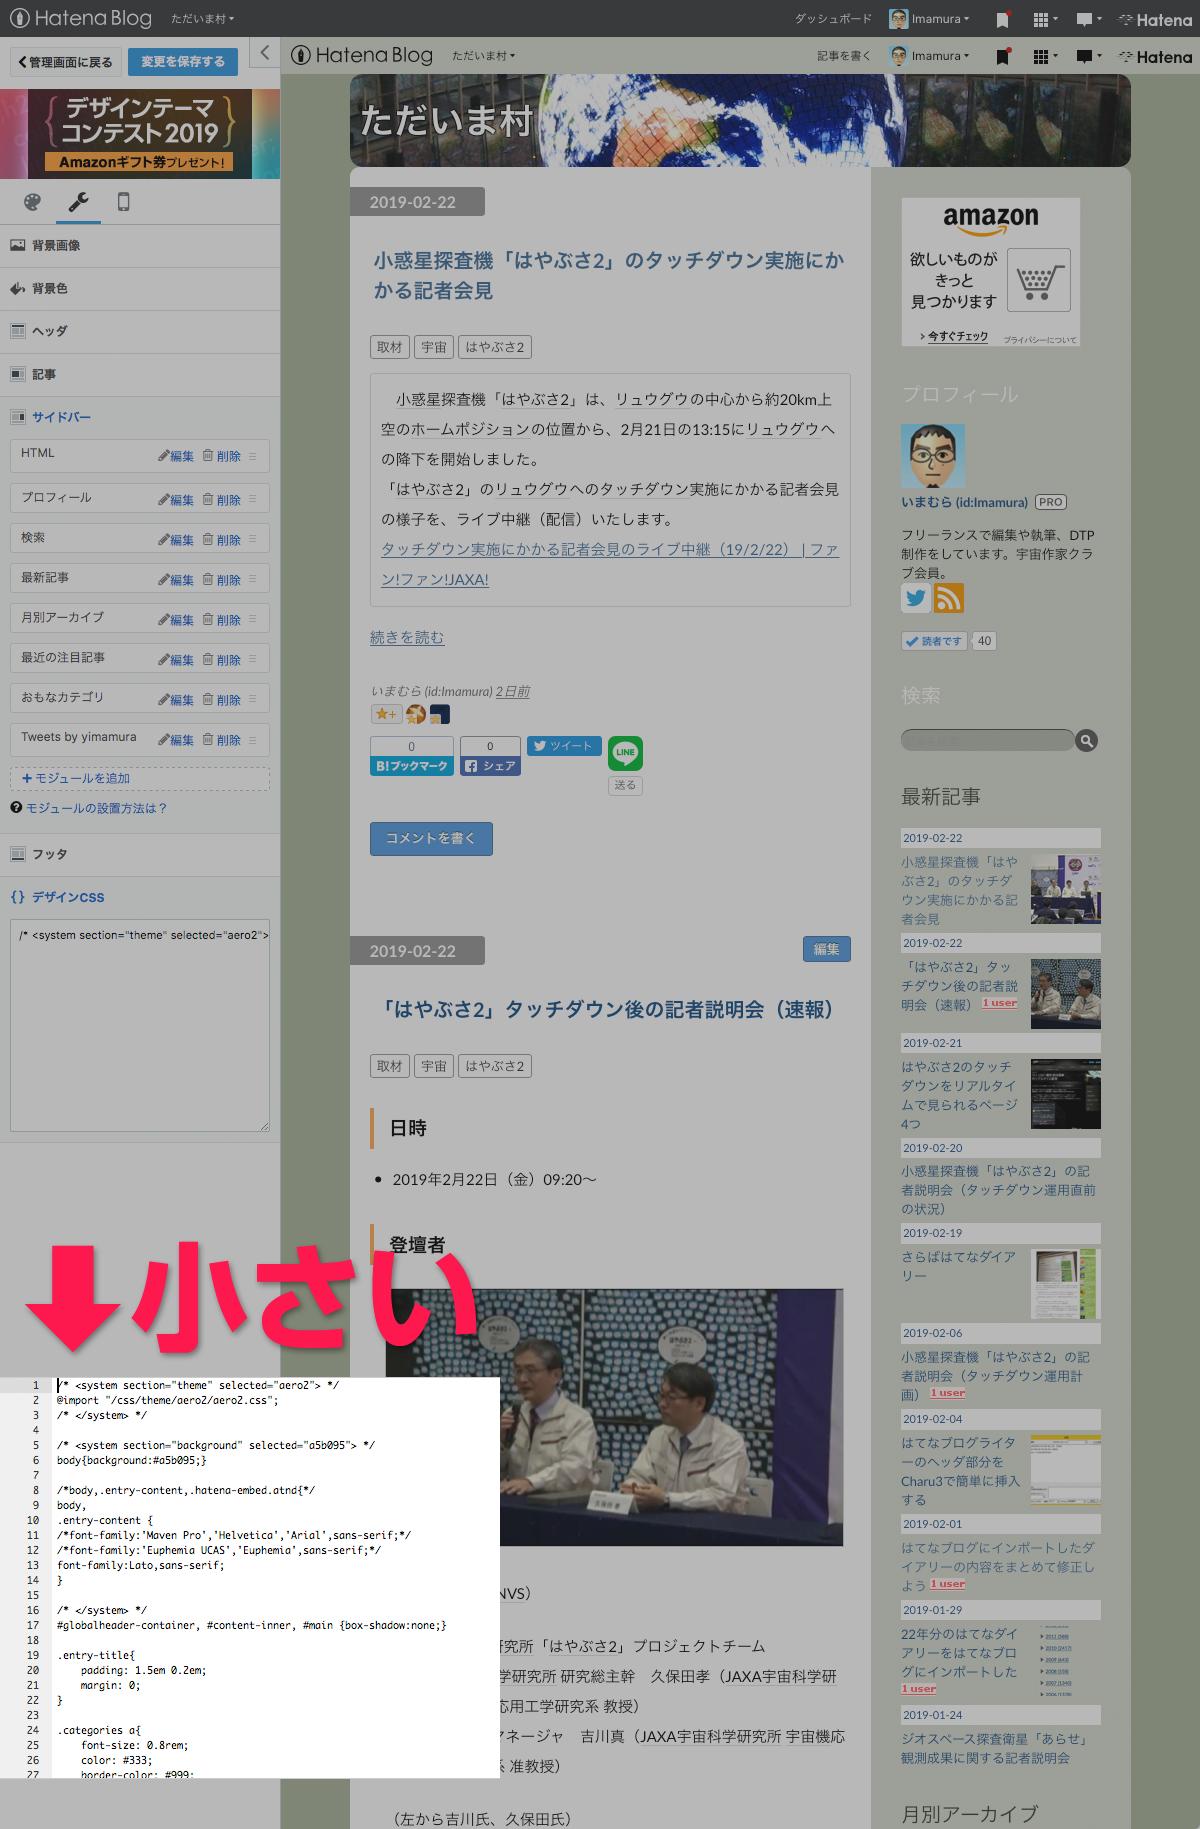 f:id:Imamura:20190224202311p:plain